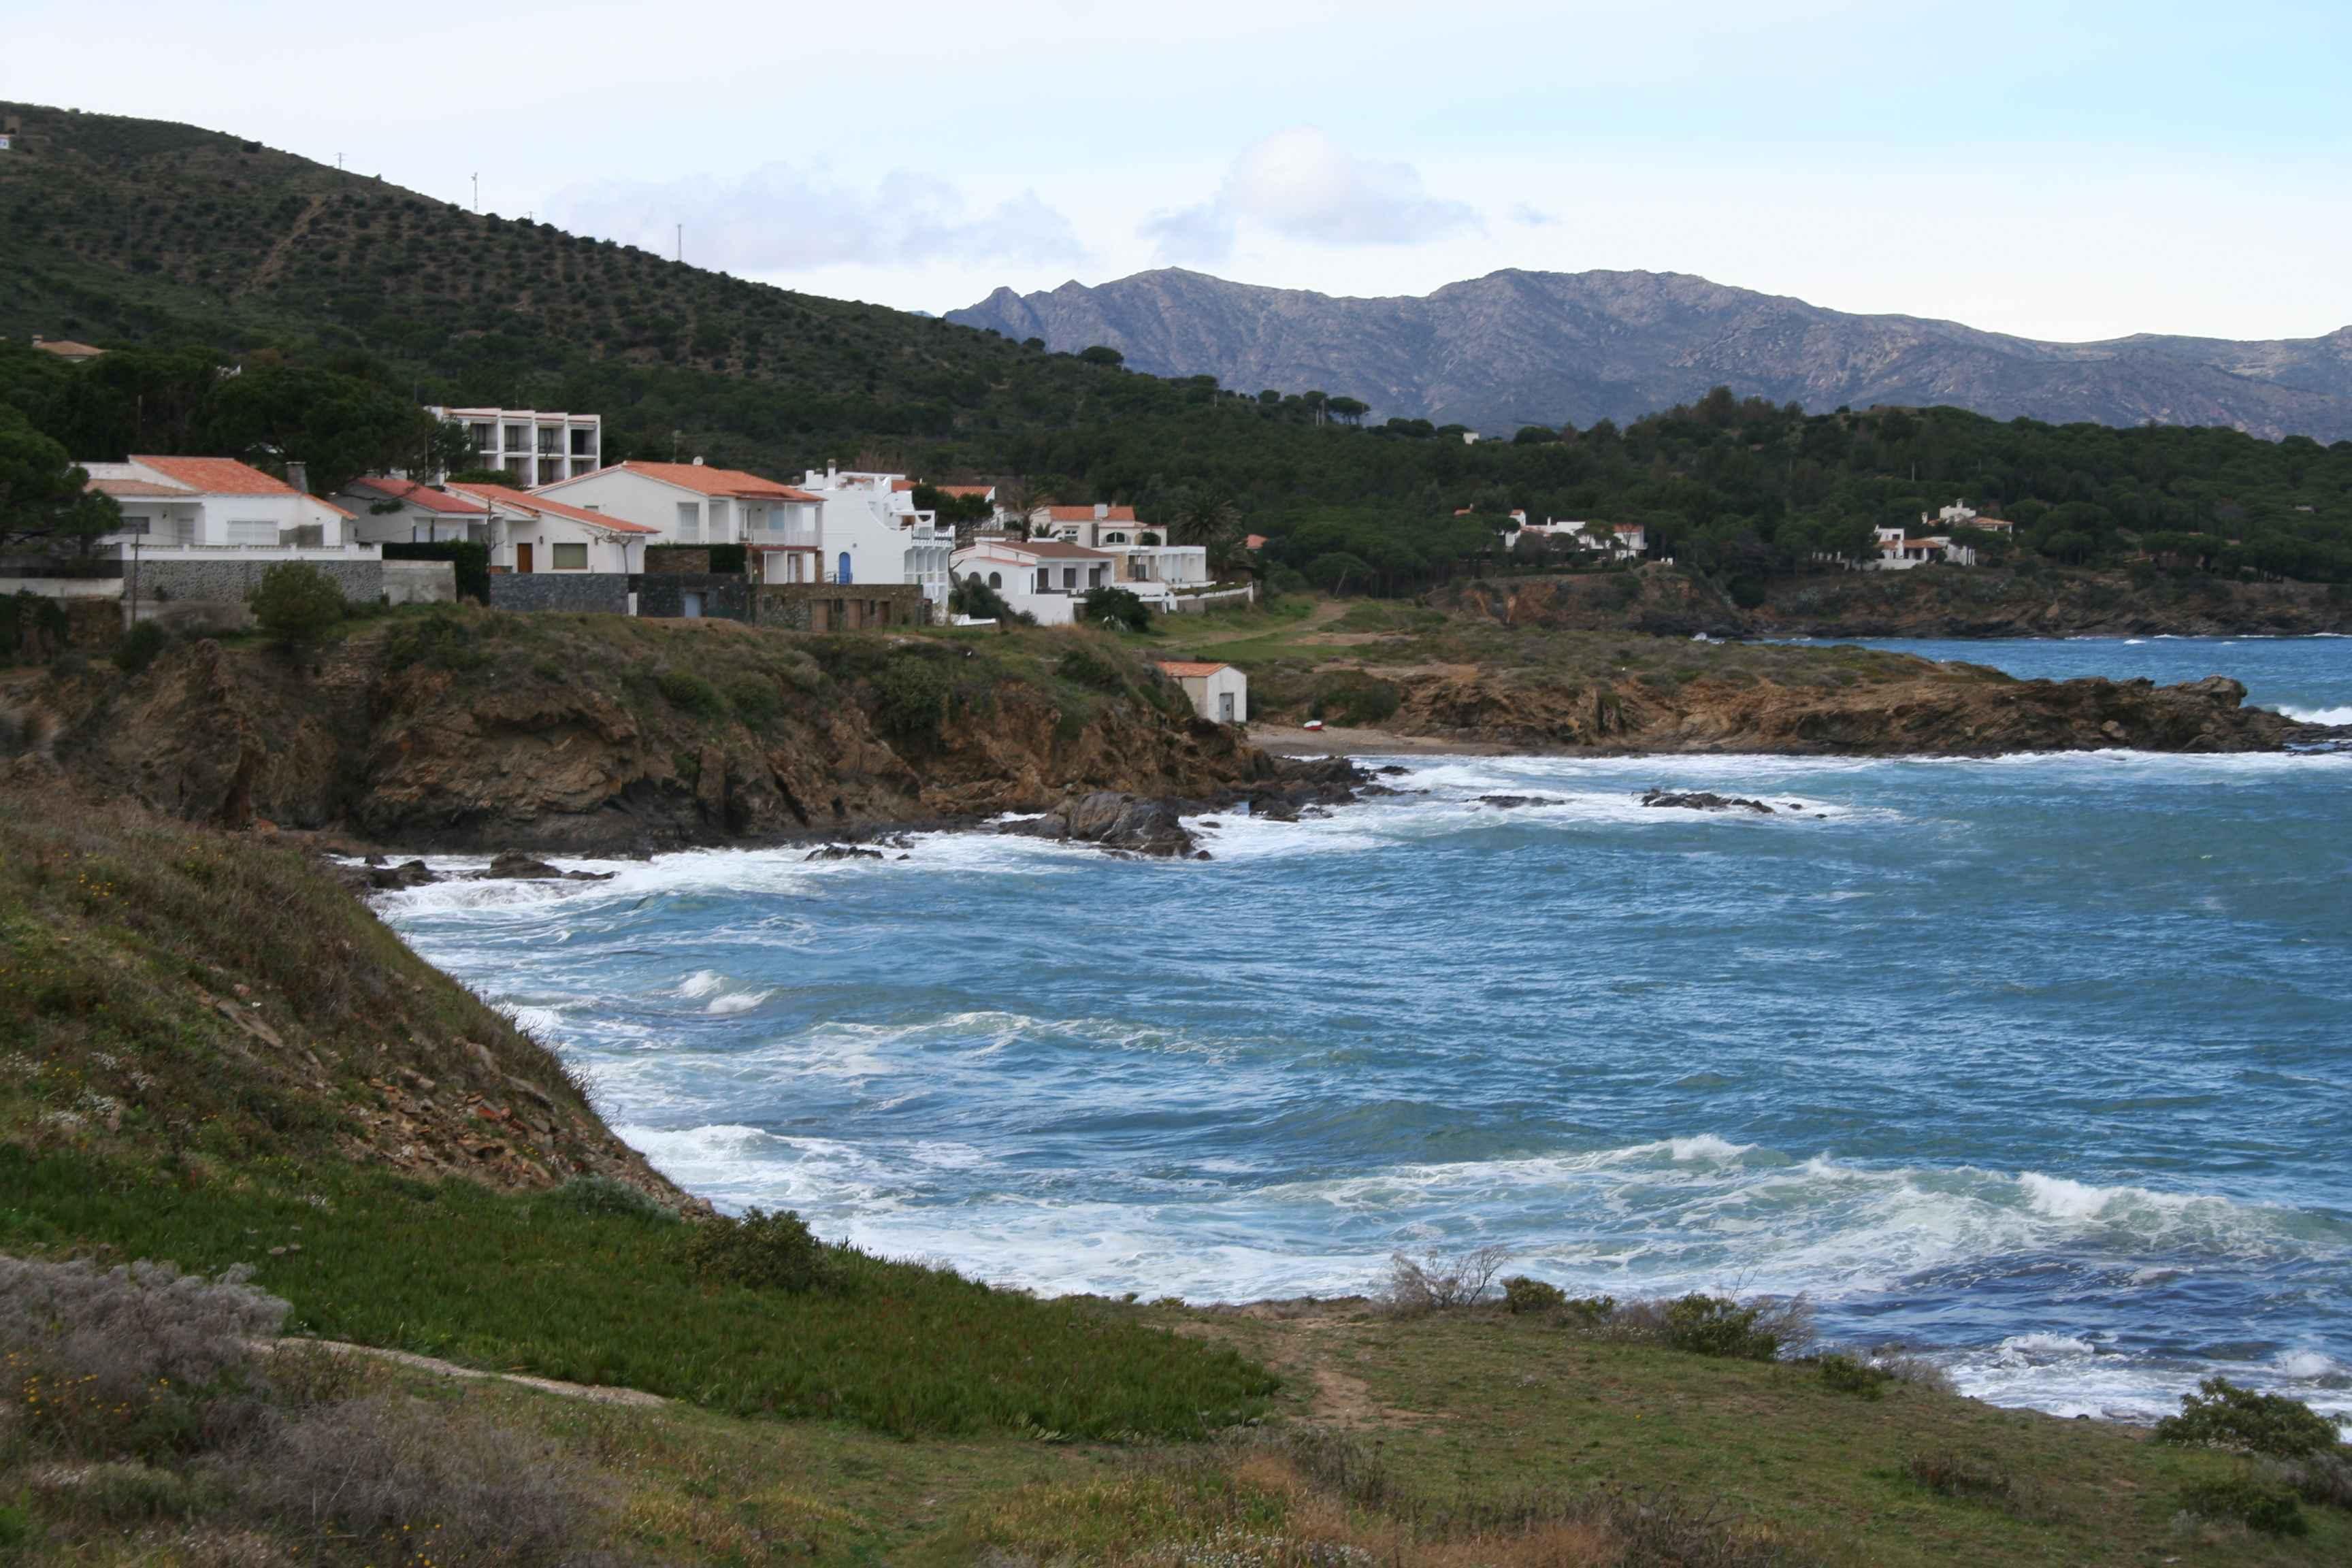 Playa Port de la Selva / La Ribera